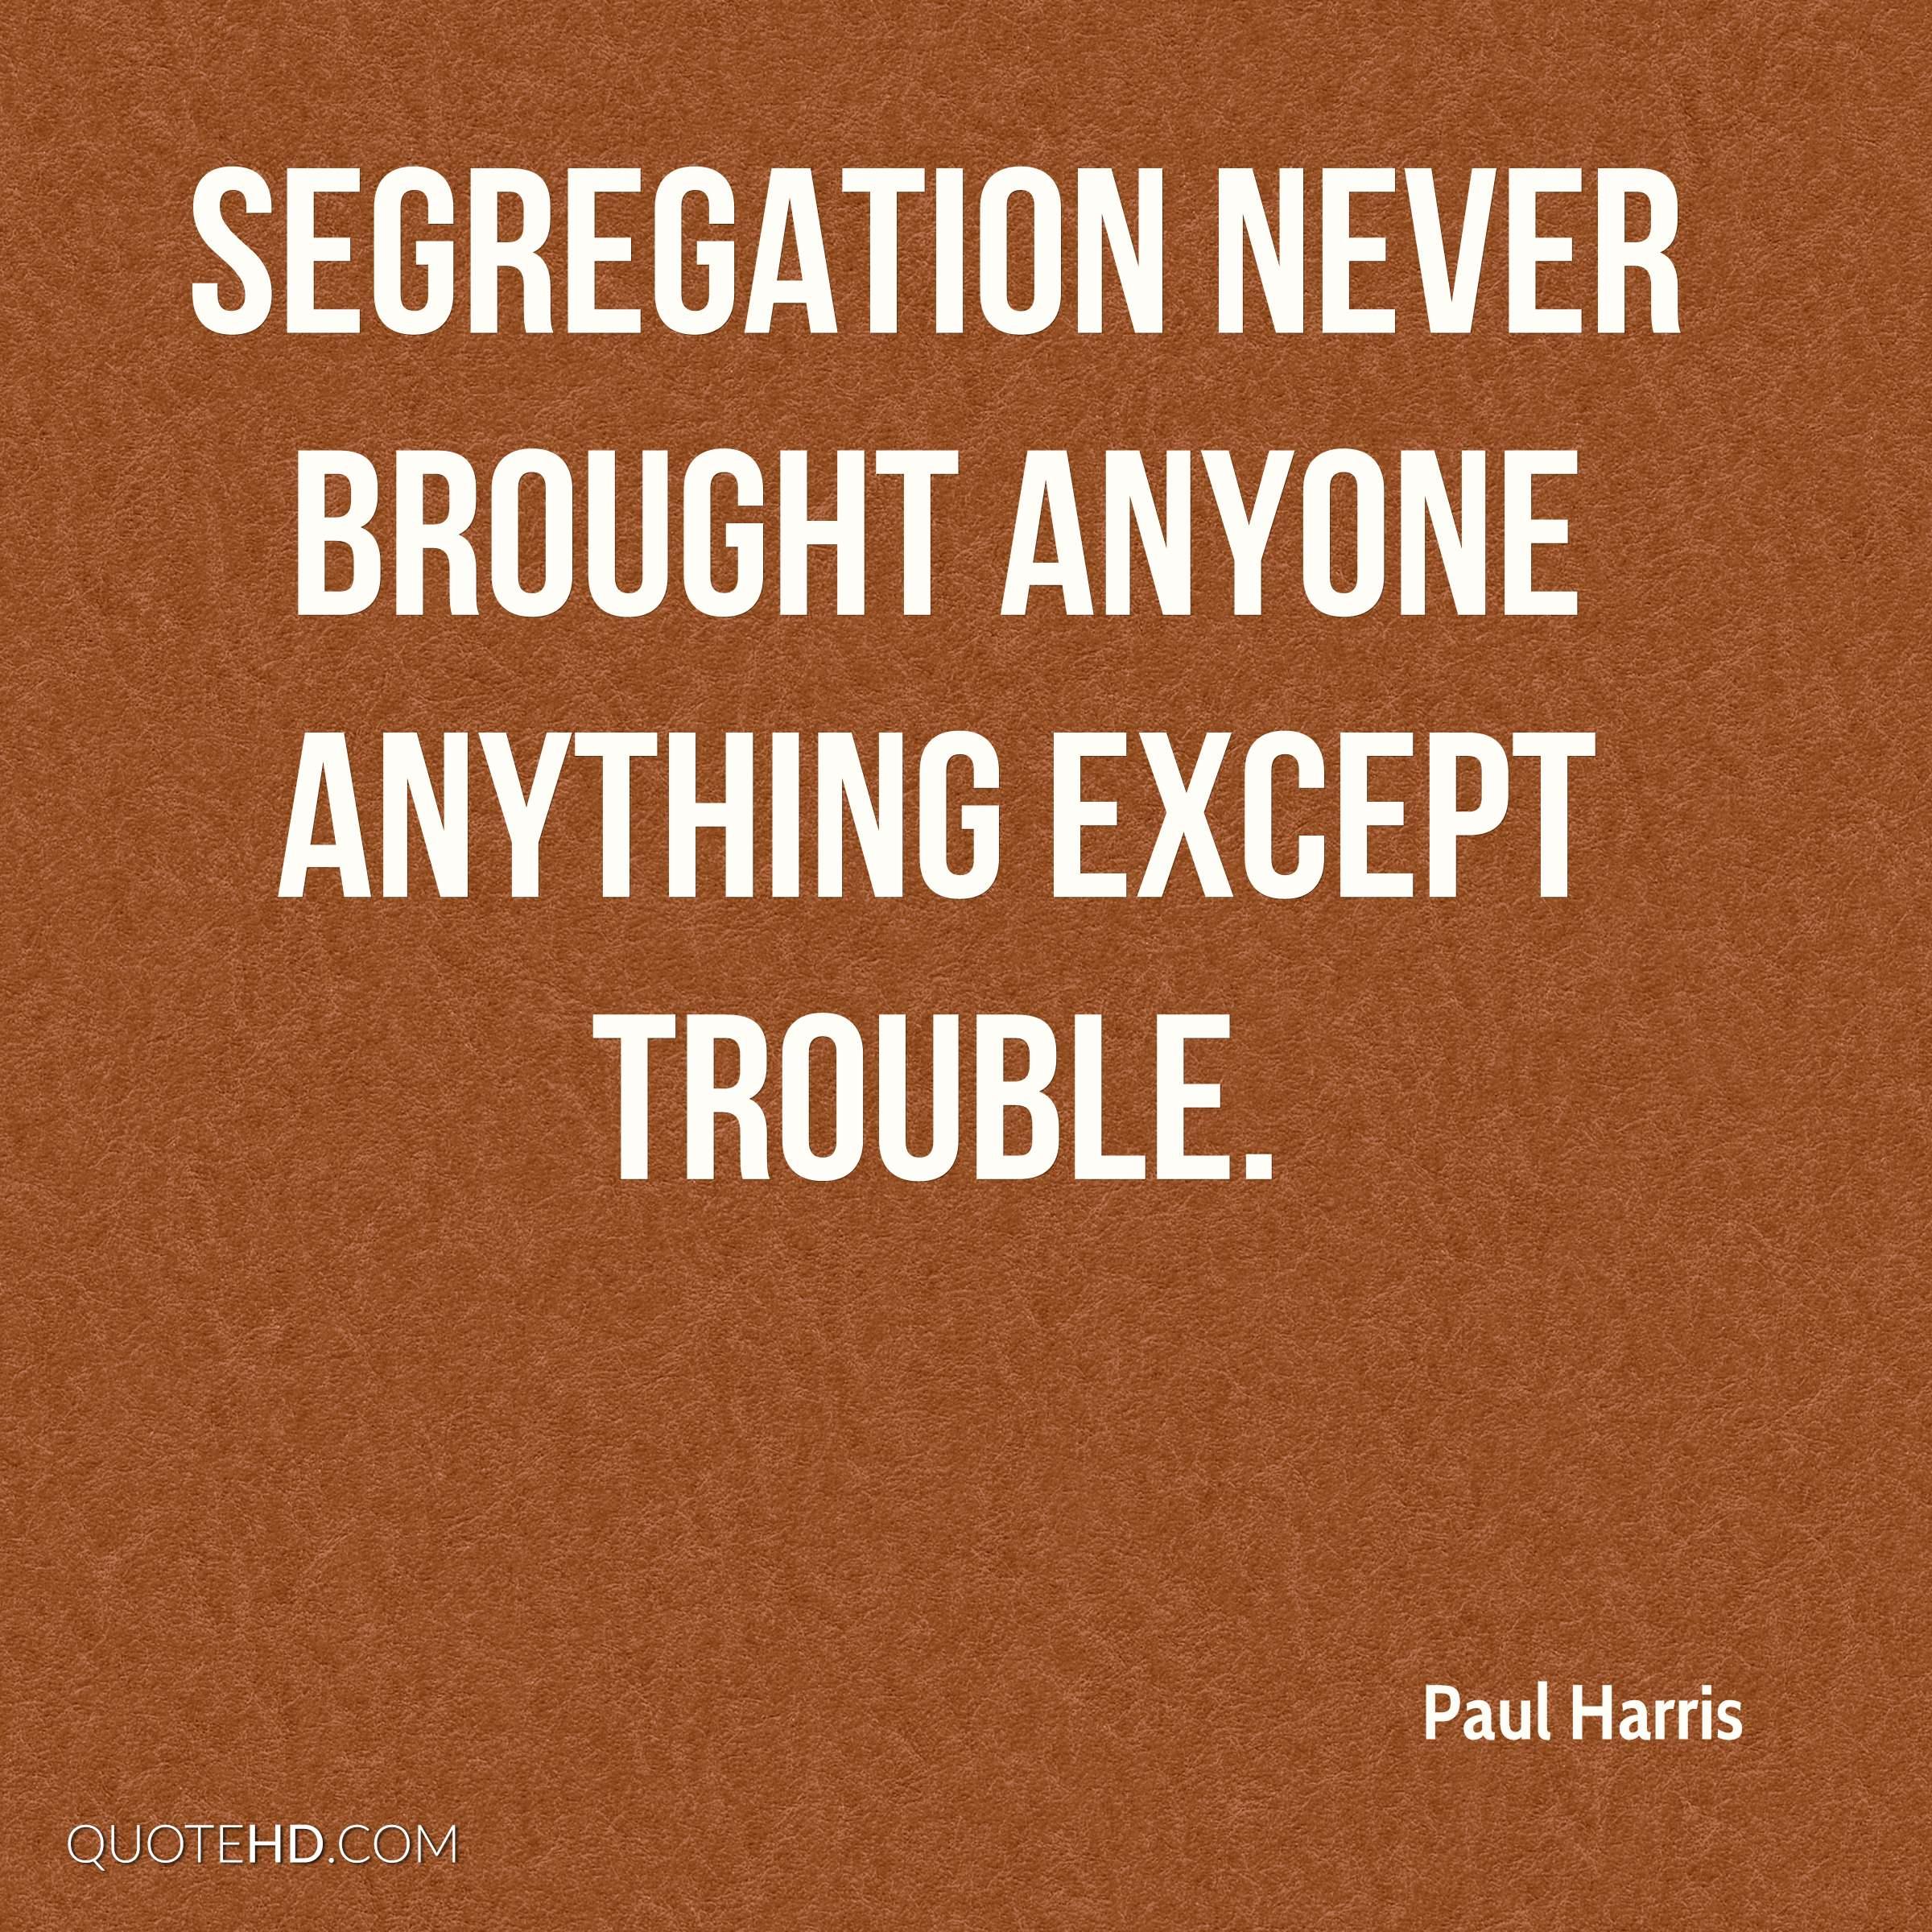 Quotescom: Famous Quotes About Segregation. QuotesGram